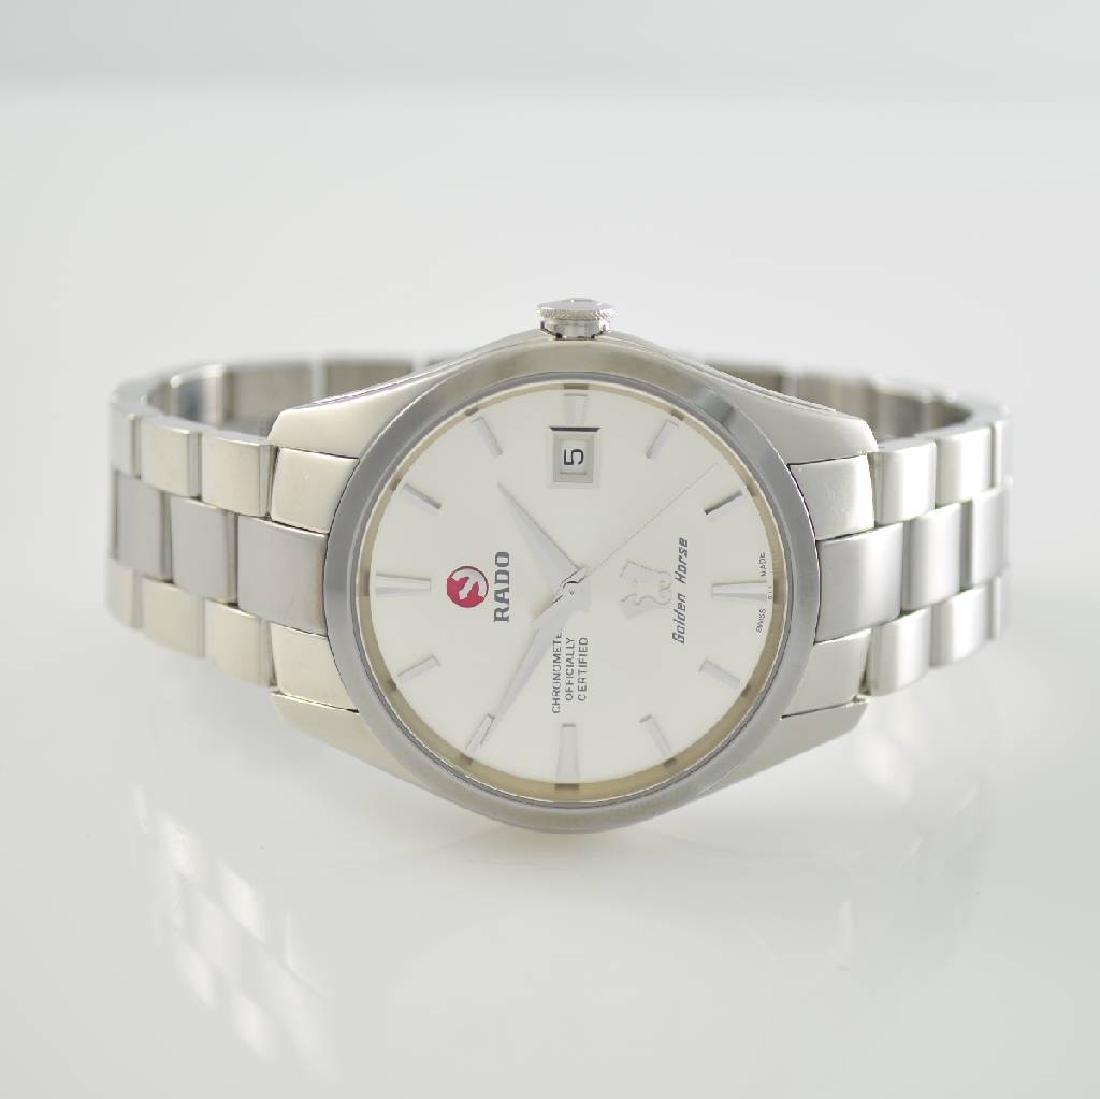 RADO self winding wristwatch Hyperchrome